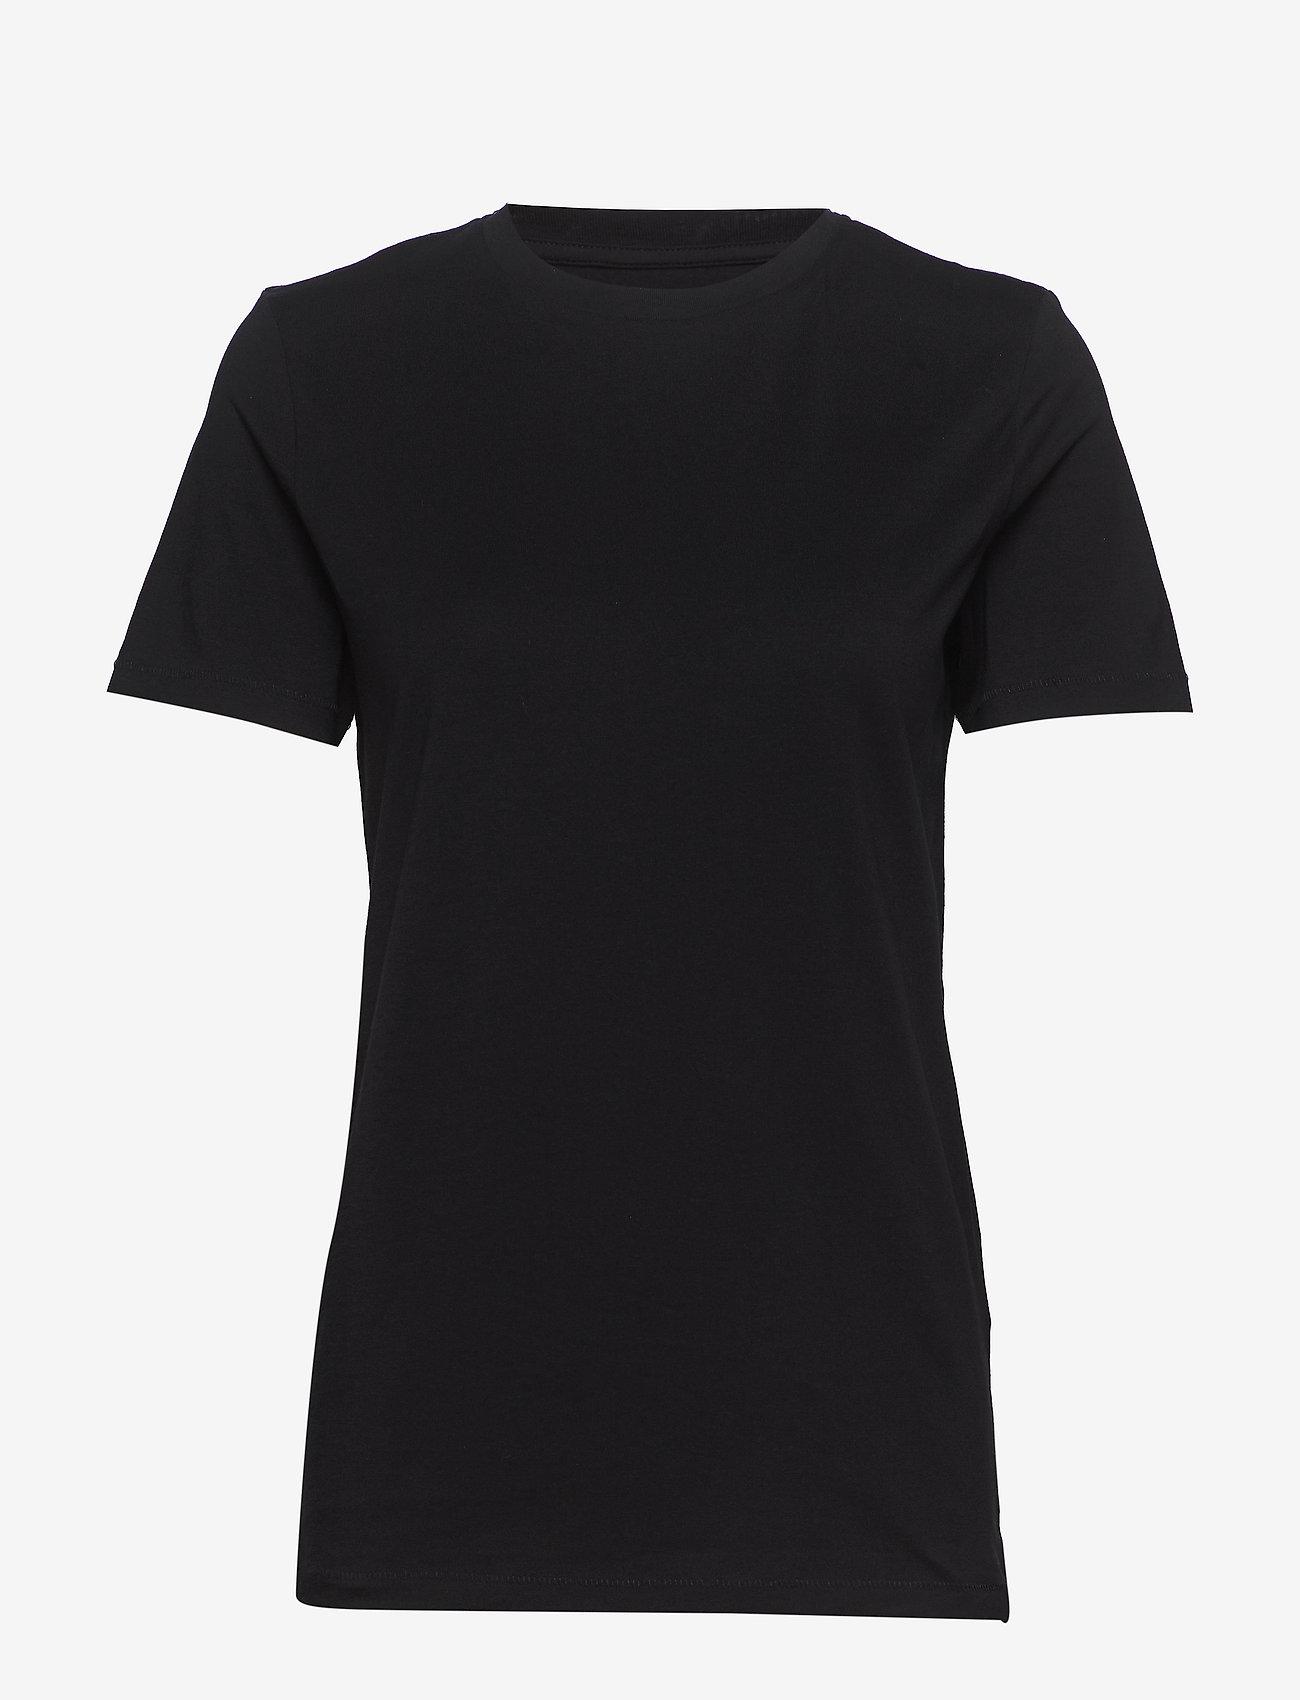 Selected Femme - SLFMY PERFECTS TEEOX CUT - t-krekli - black - 0